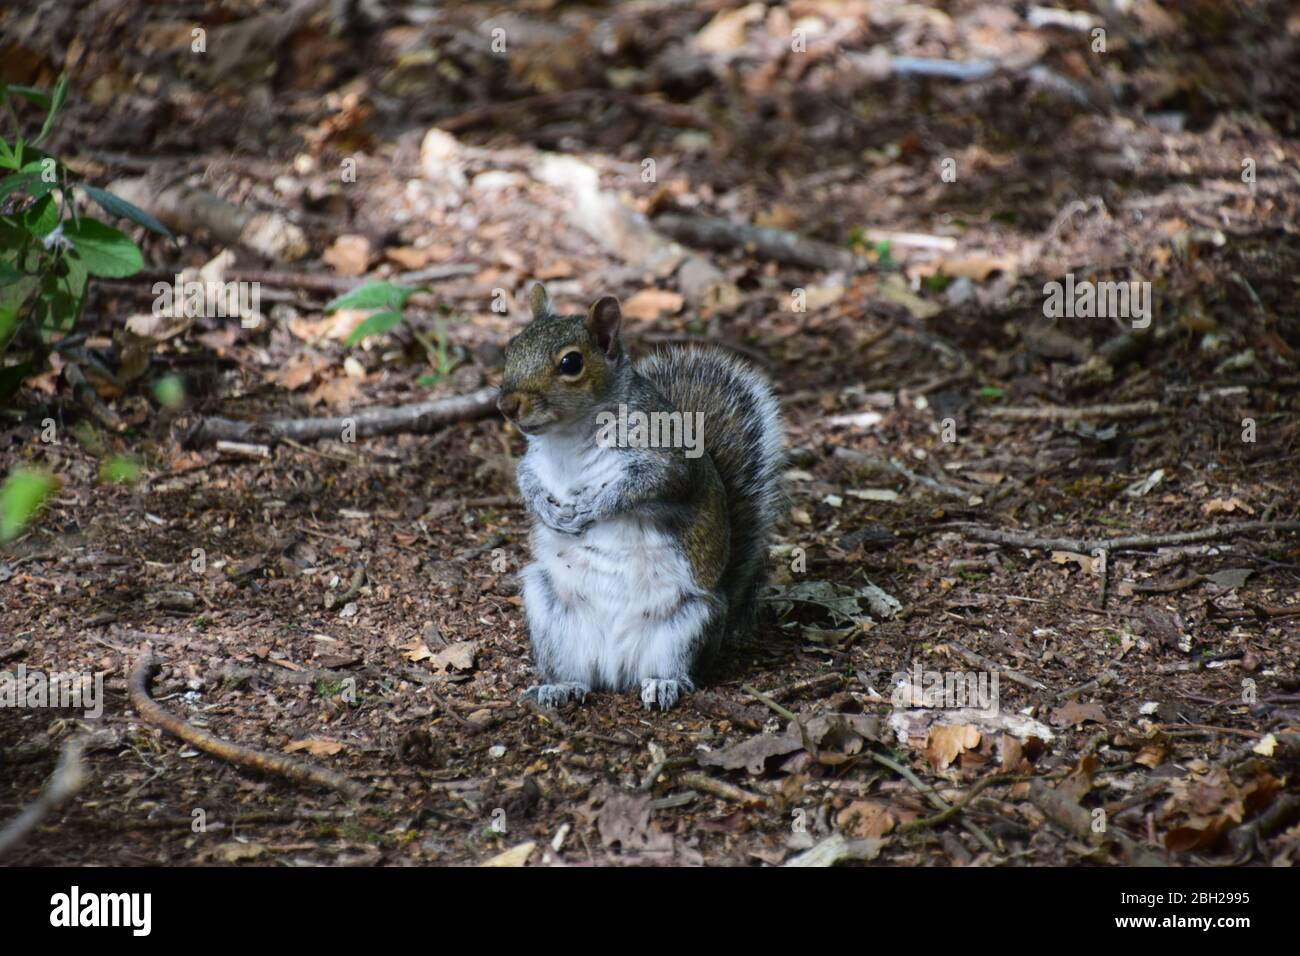 Grey Squirrels(Sciurus Carolinensis) on the forest floor at Sankey Valley Woods St Helens Merseyside. Stock Photo